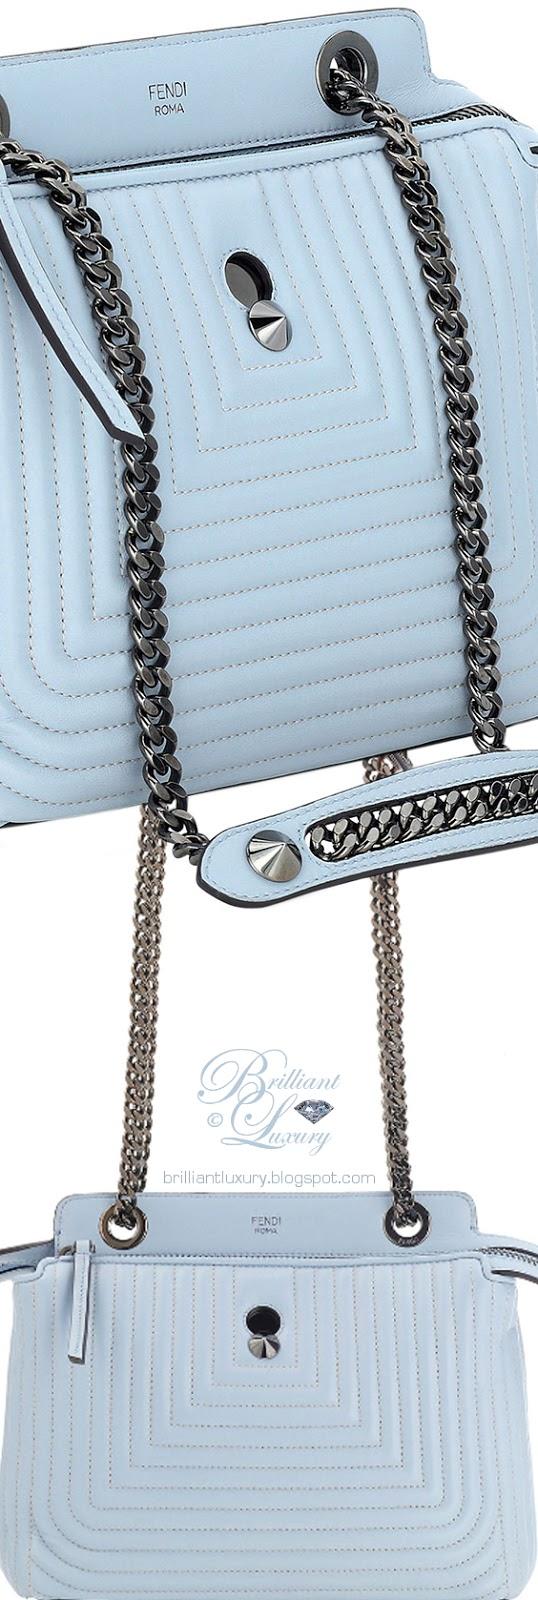 Brilliant Luxury ♦ Fendi Dotcom Click blue leather shoulder bag